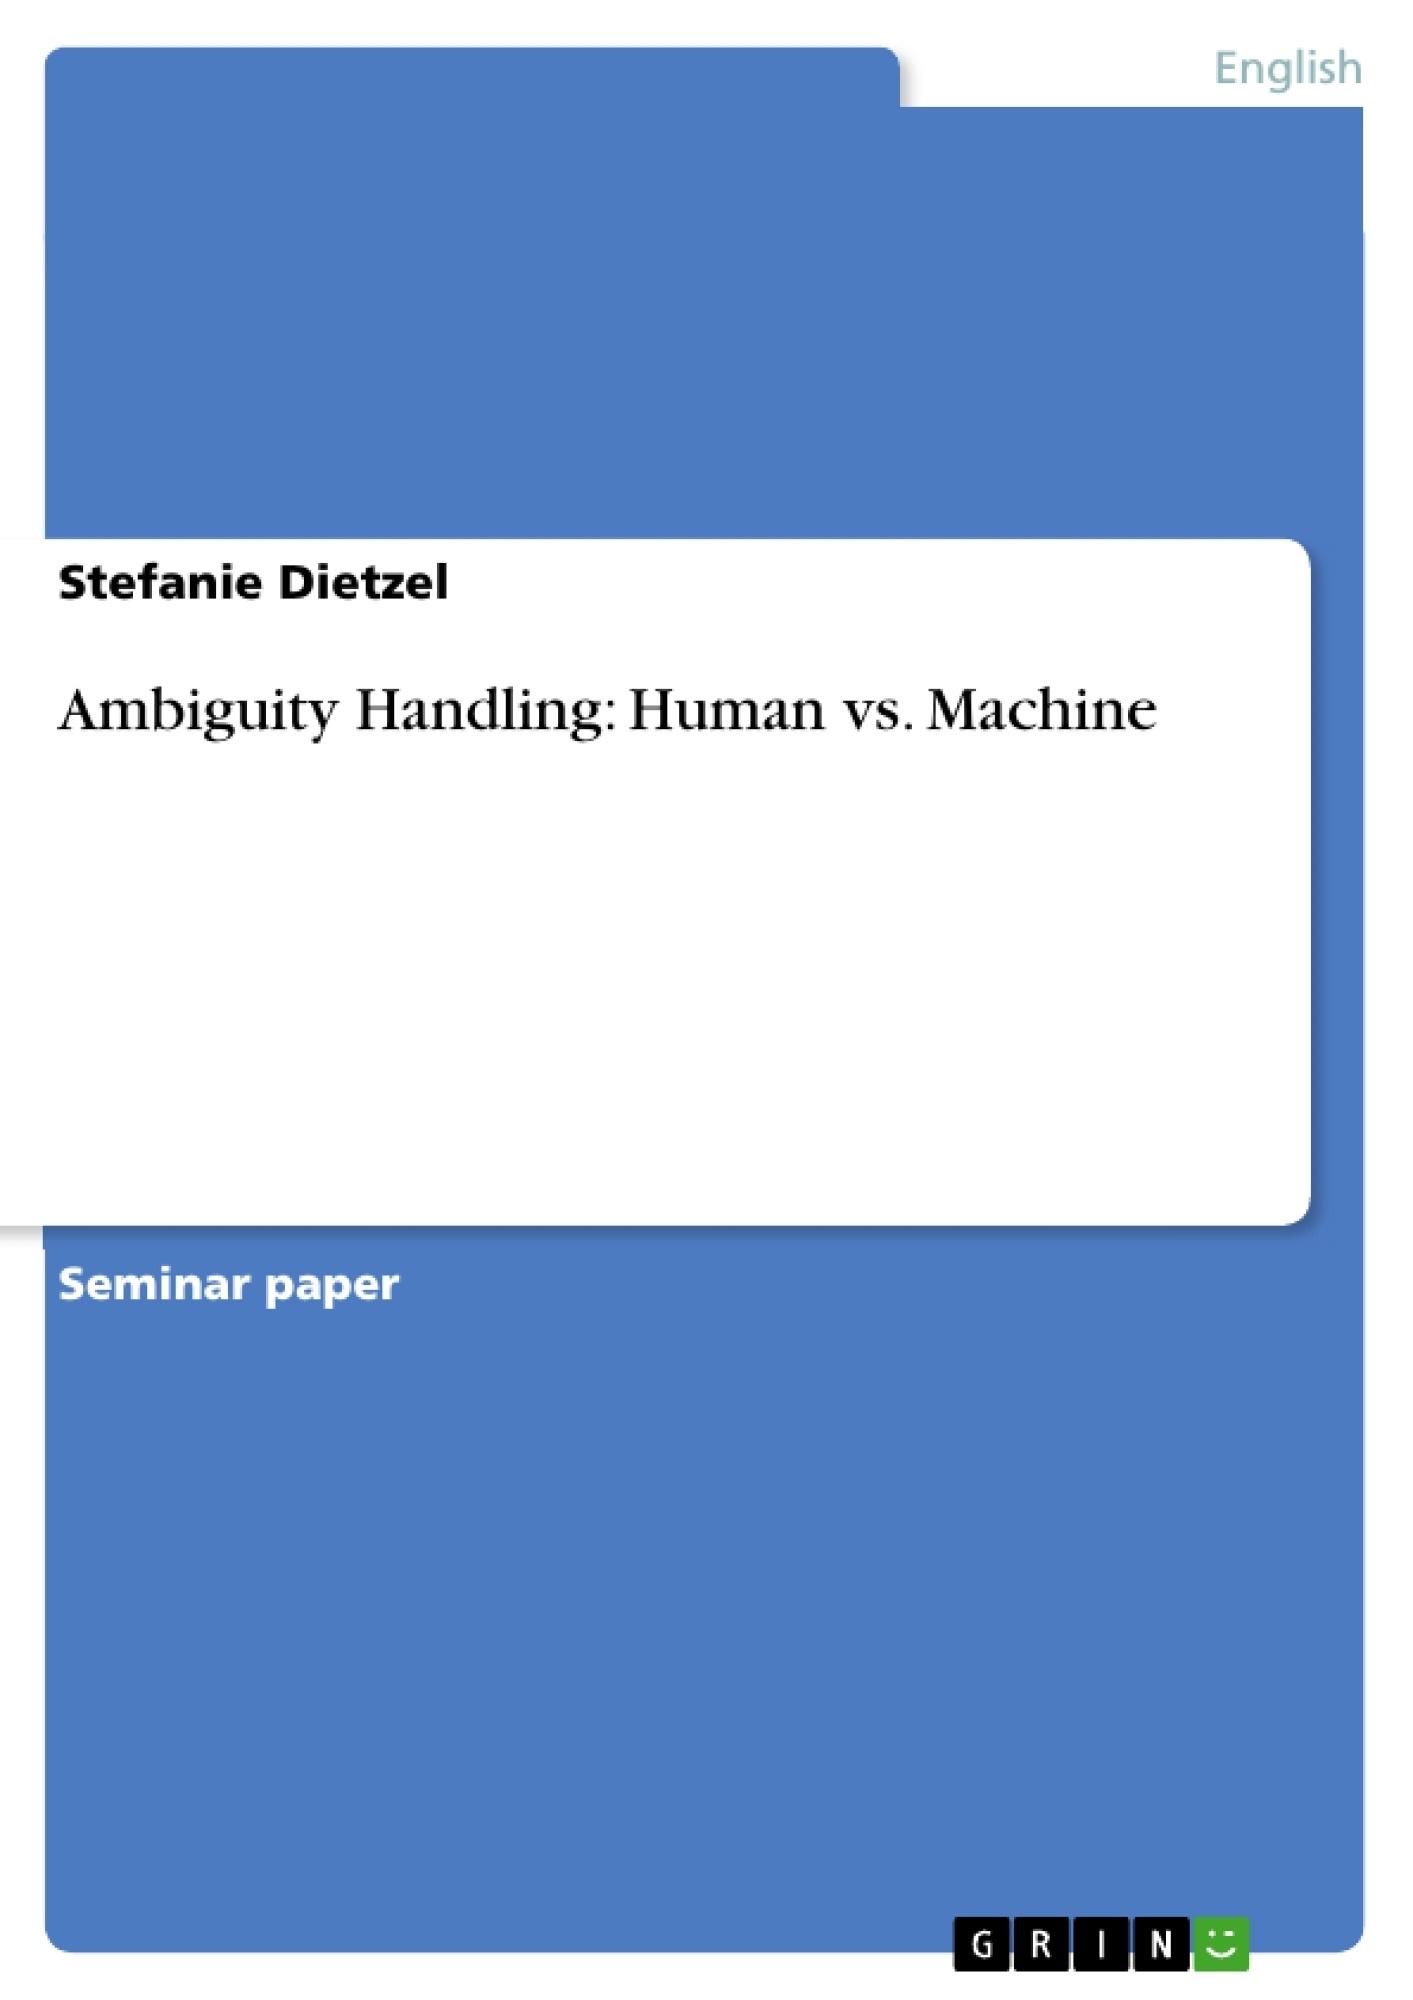 Title: Ambiguity Handling: Human vs. Machine